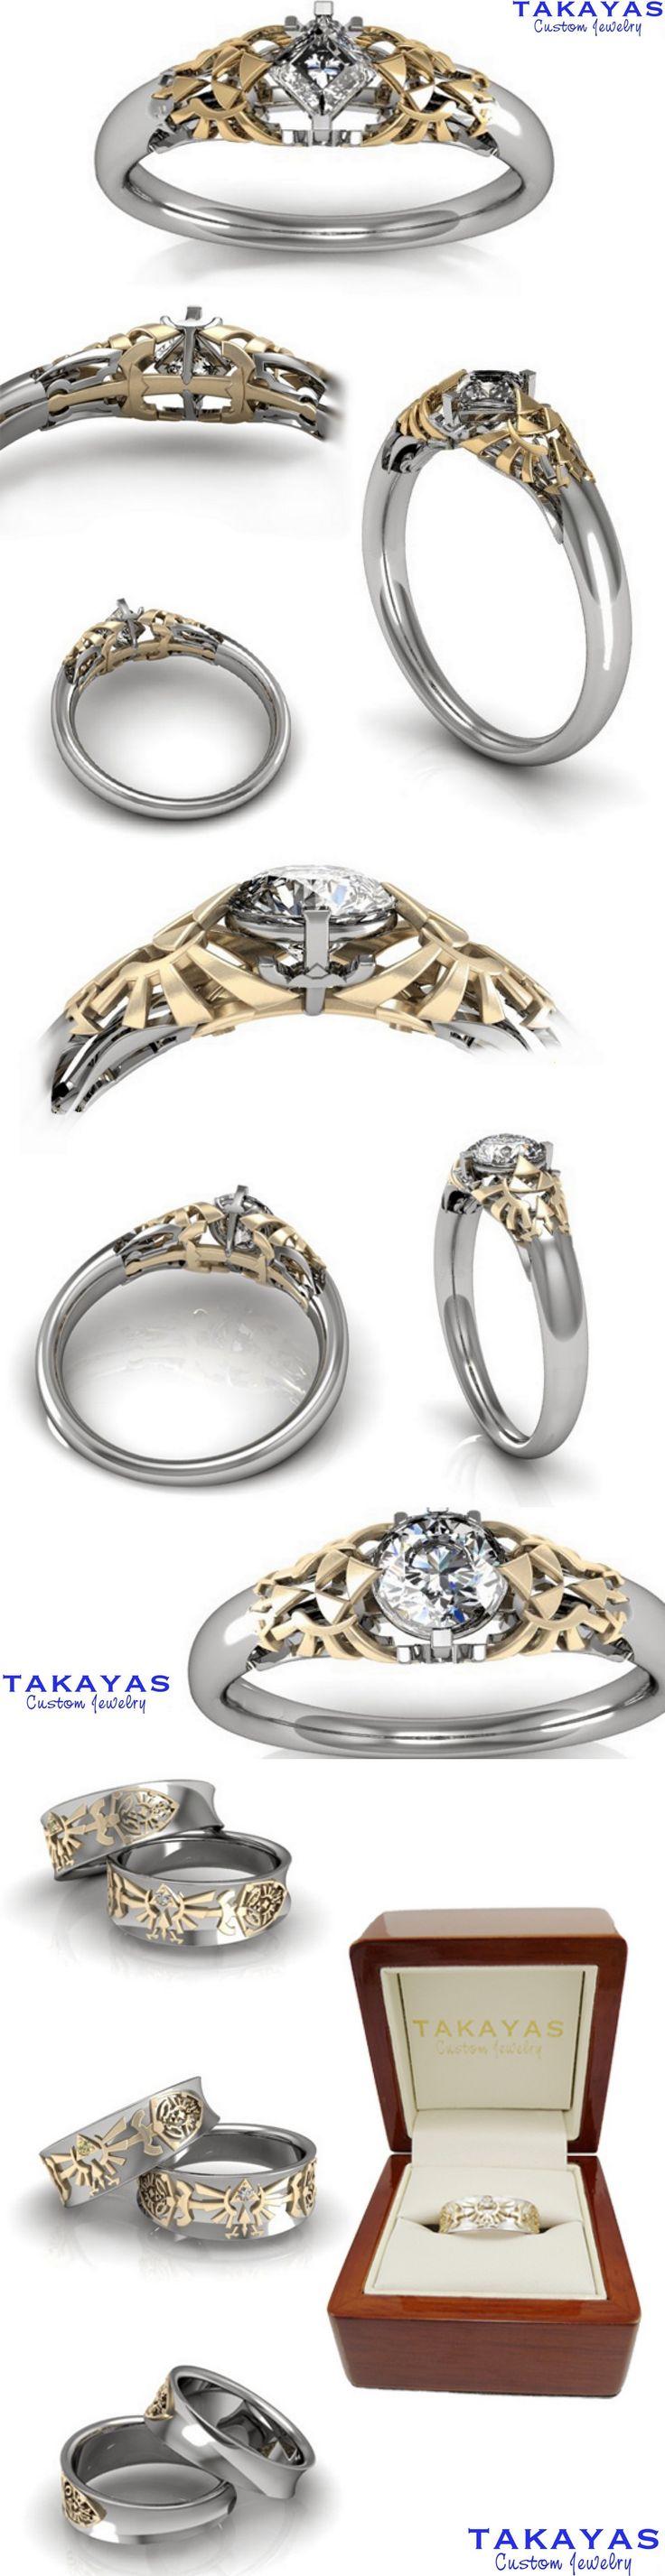 nerd engagement ring hello kitty wedding ring Legend of Zelda Wedding Collection by Takayas Custom Jewelry http pinterest